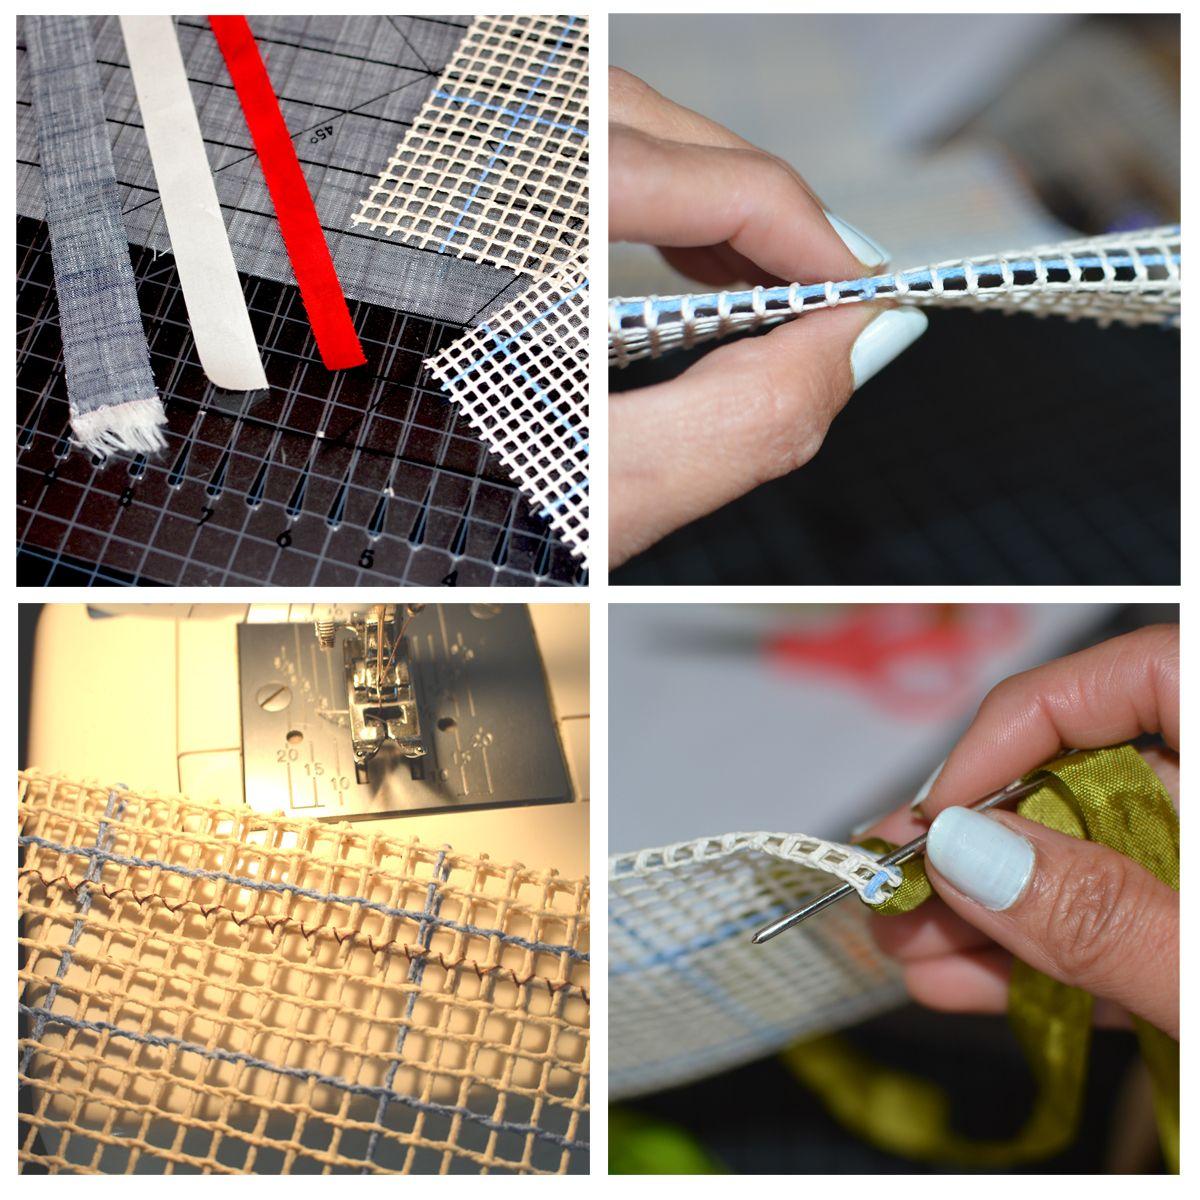 Top 10 Locker Hooking Tips Cutting Strips Preparing Canvas Framing Edges